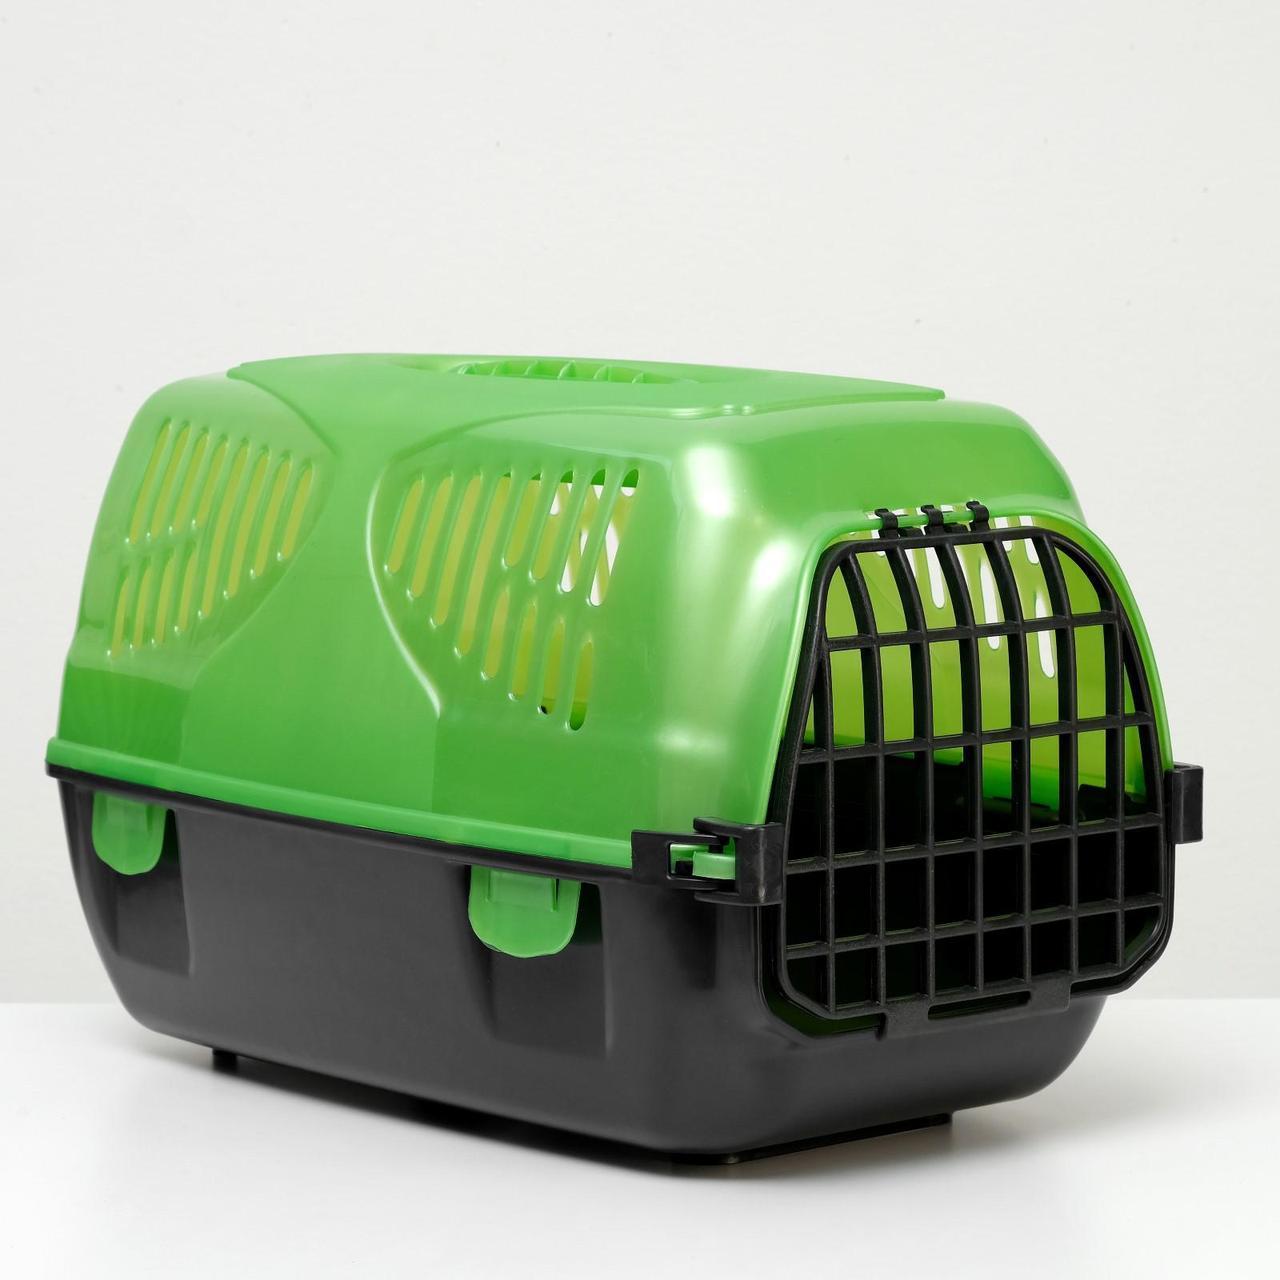 "Переноска для животных ""Сириус"" 33,5 х 31 х 50 см, цвет зеленый перламутр"